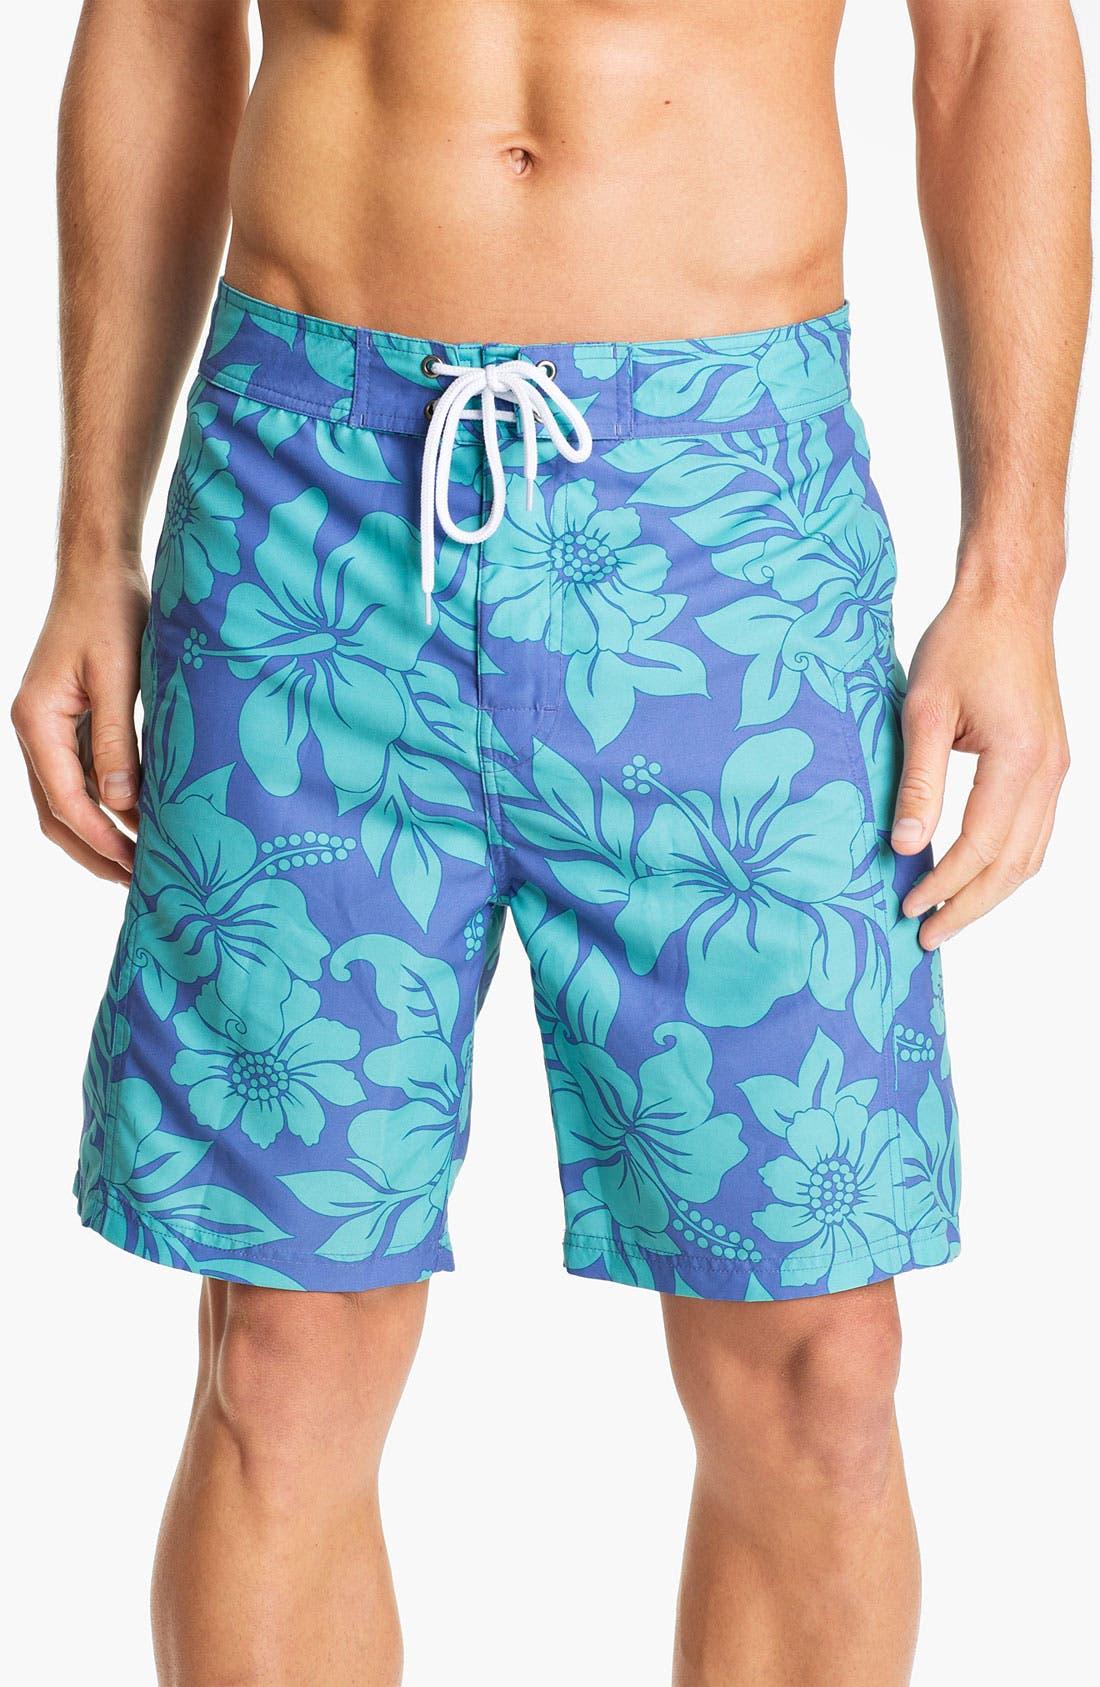 Alternate Image 1 Selected - Trunks Surf & Swim 'Salty Boardie' Board Shorts